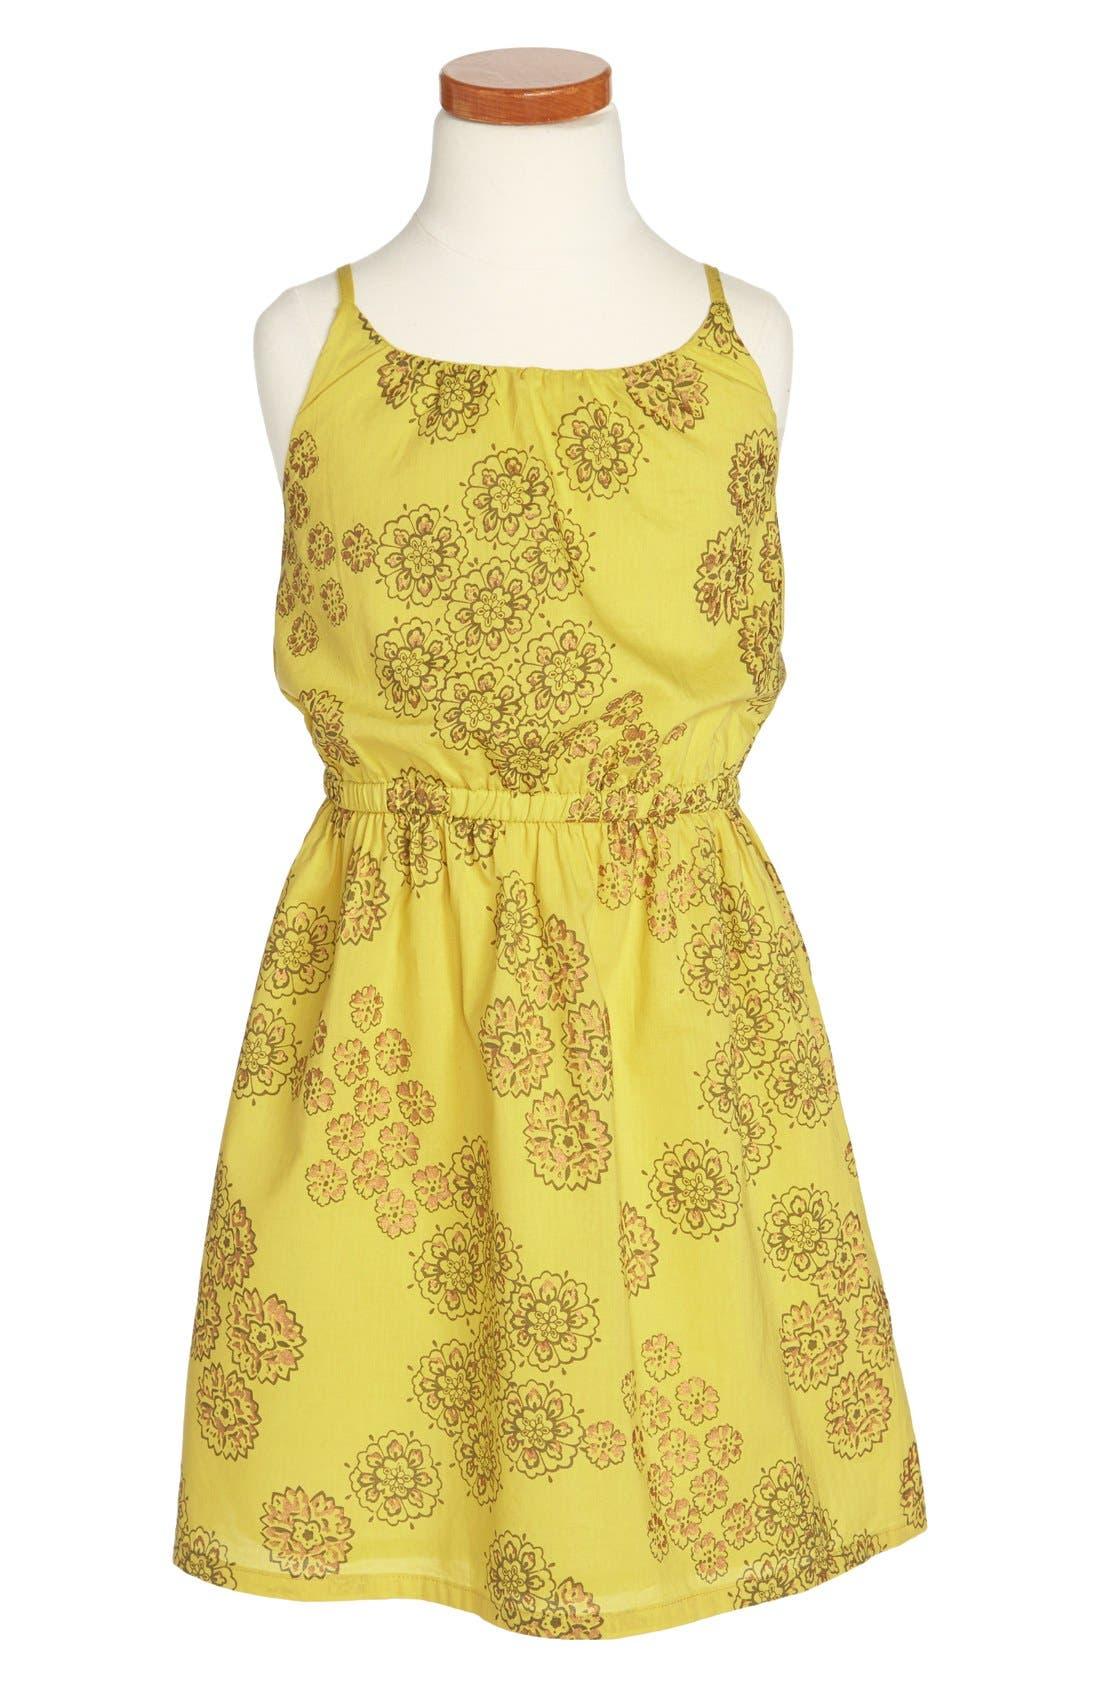 Main Image - Peek 'Violet' Cotton Sundress (Toddler Girls, Little Girls & Big Girls)